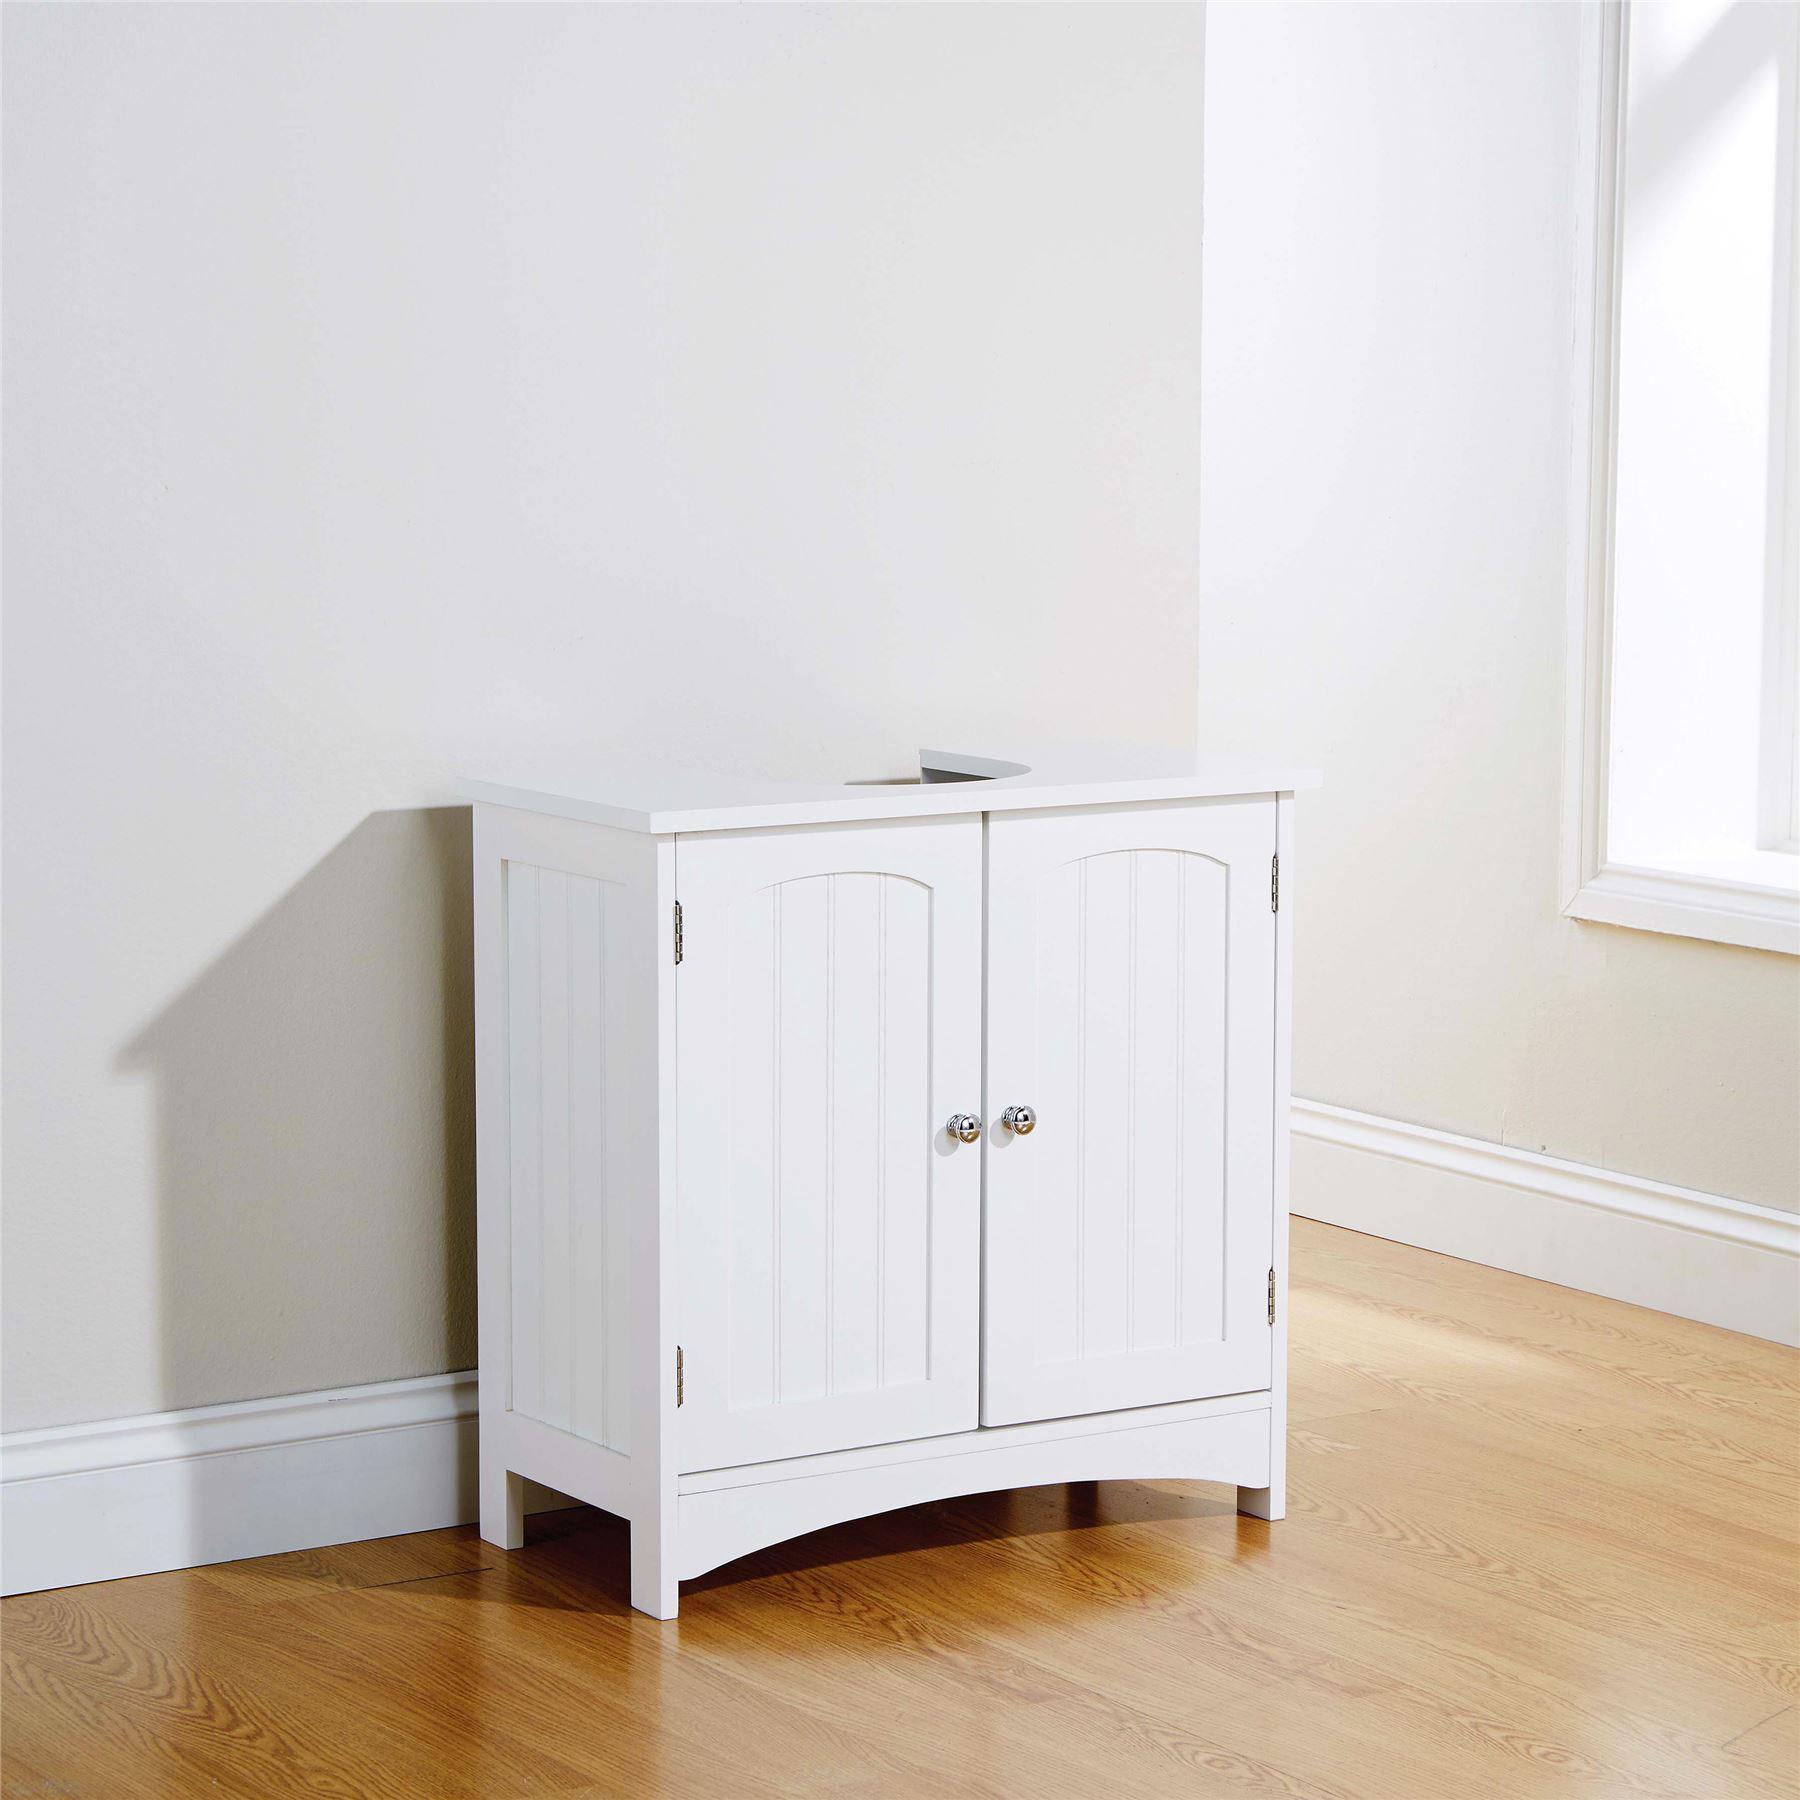 Lastest St Ives Bathroom Furniture Range  Ideas For Storage